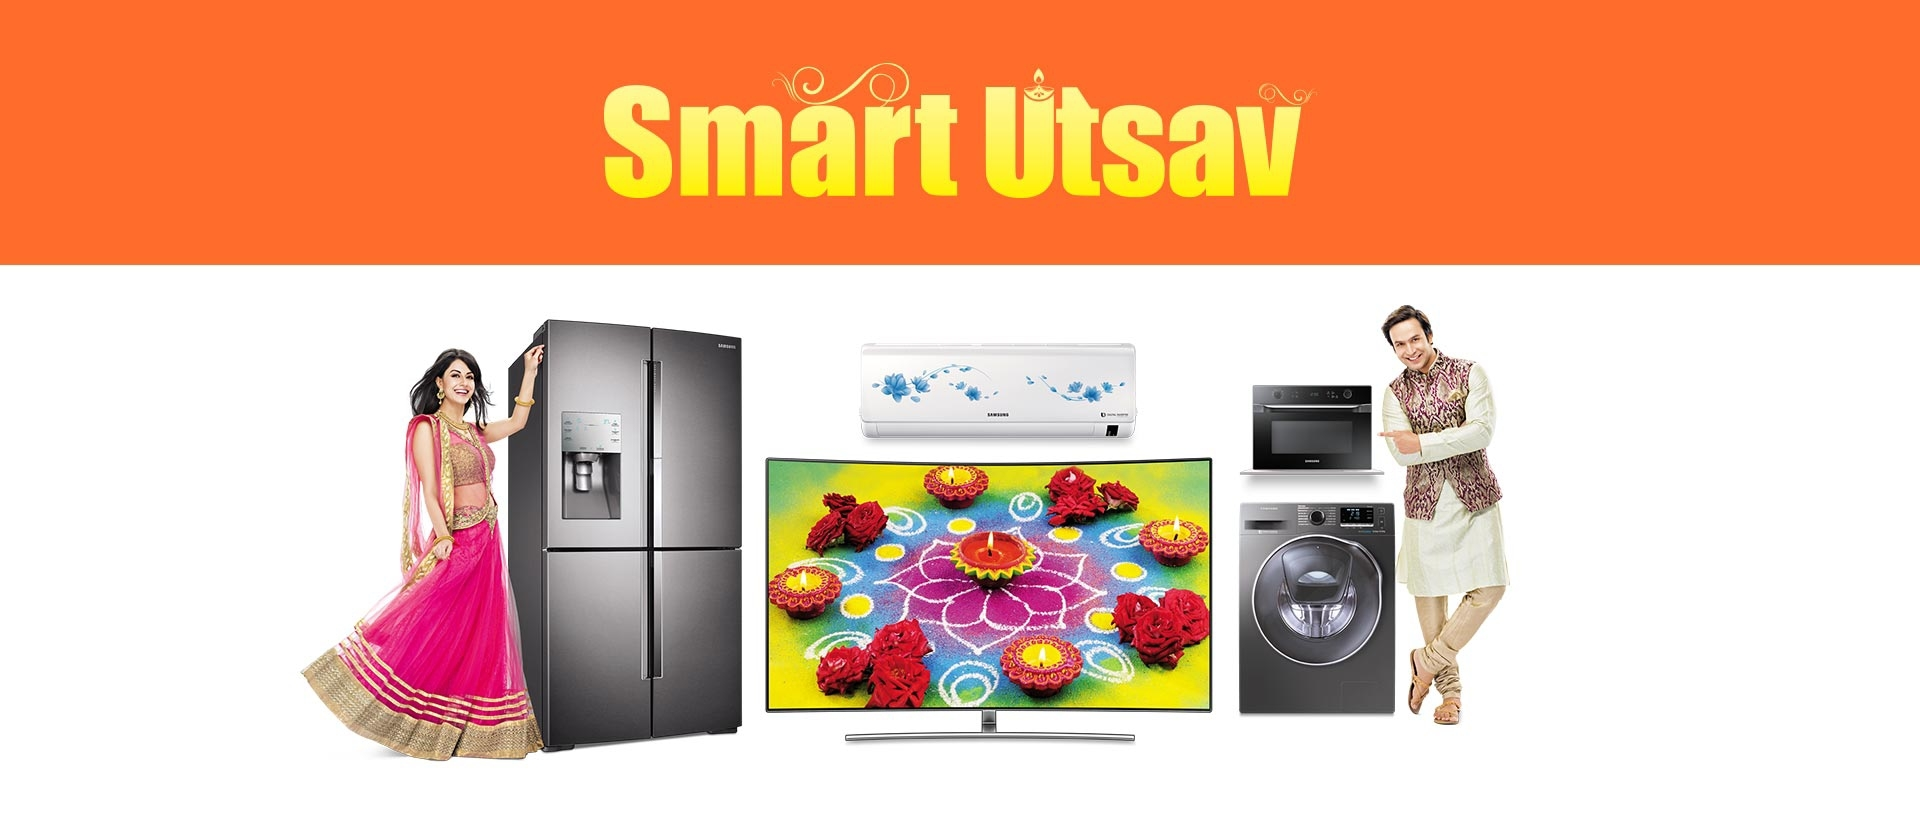 189118a062f Smart Utsav - Samsung Diwali Offers on Home Appliances